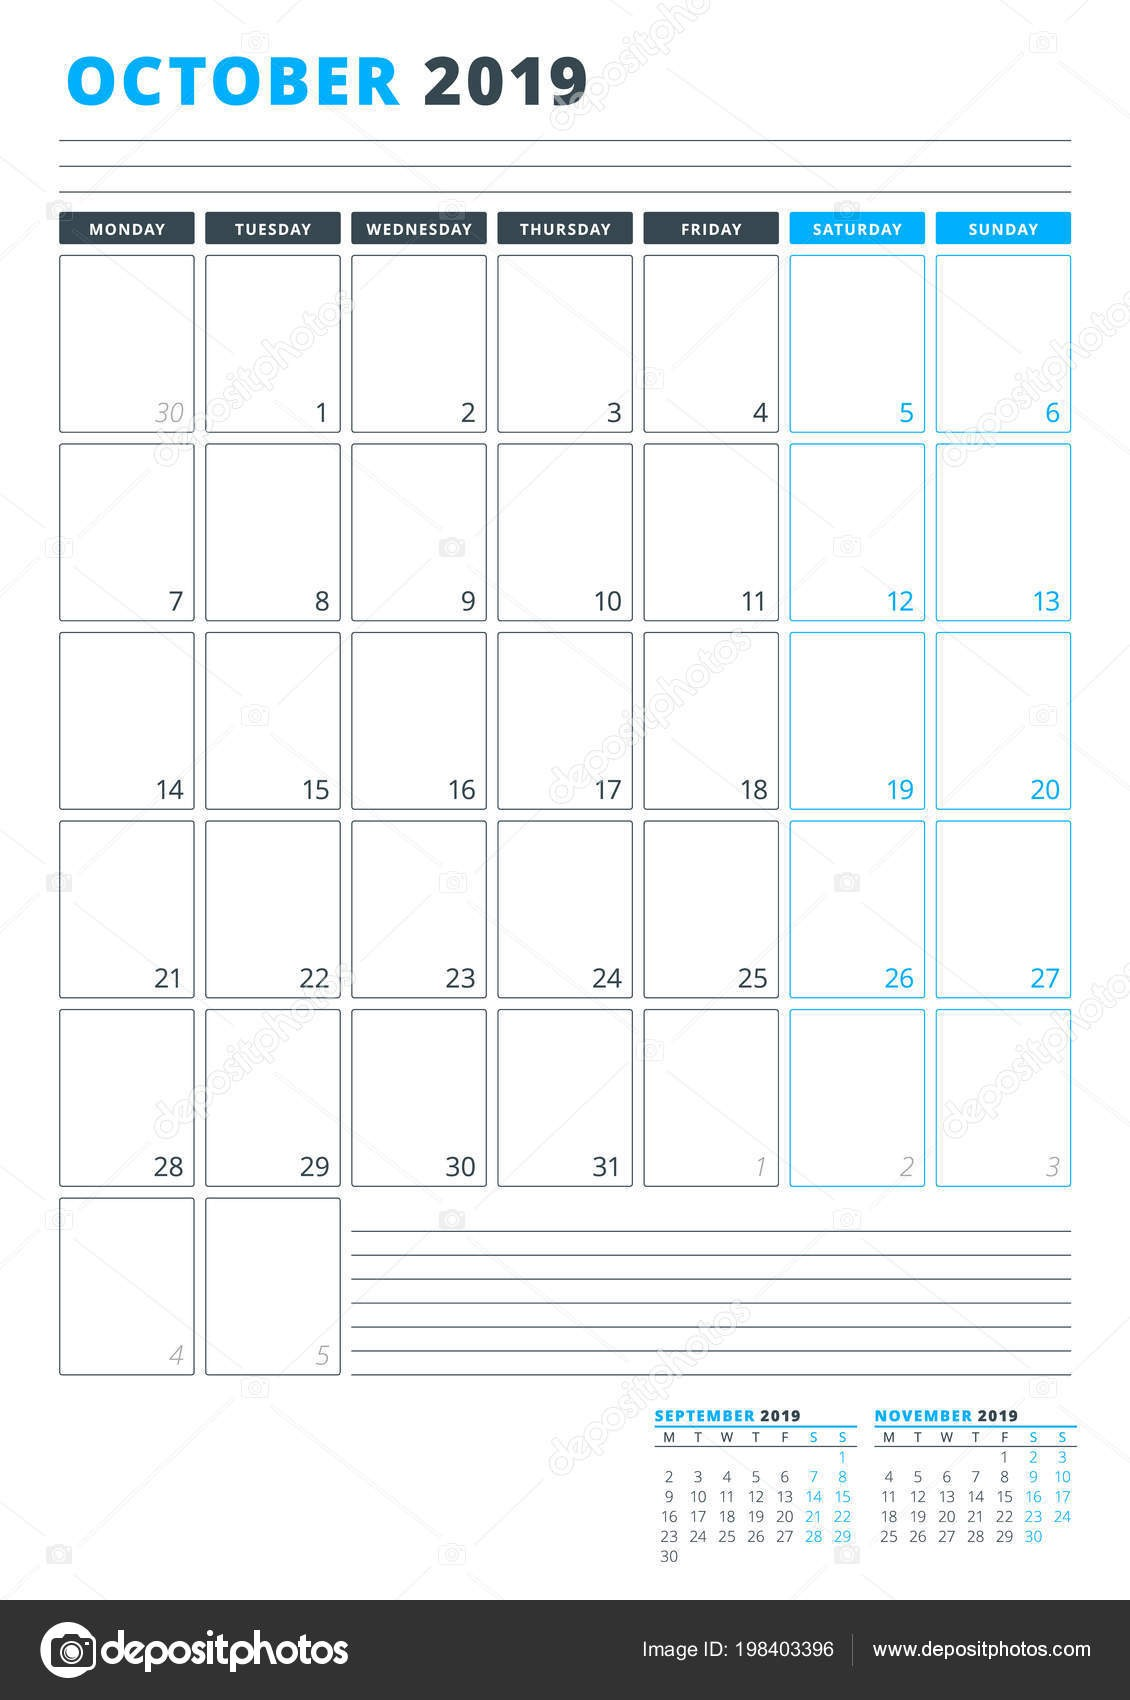 depositphotos stock illustration calendar template october 2019 business